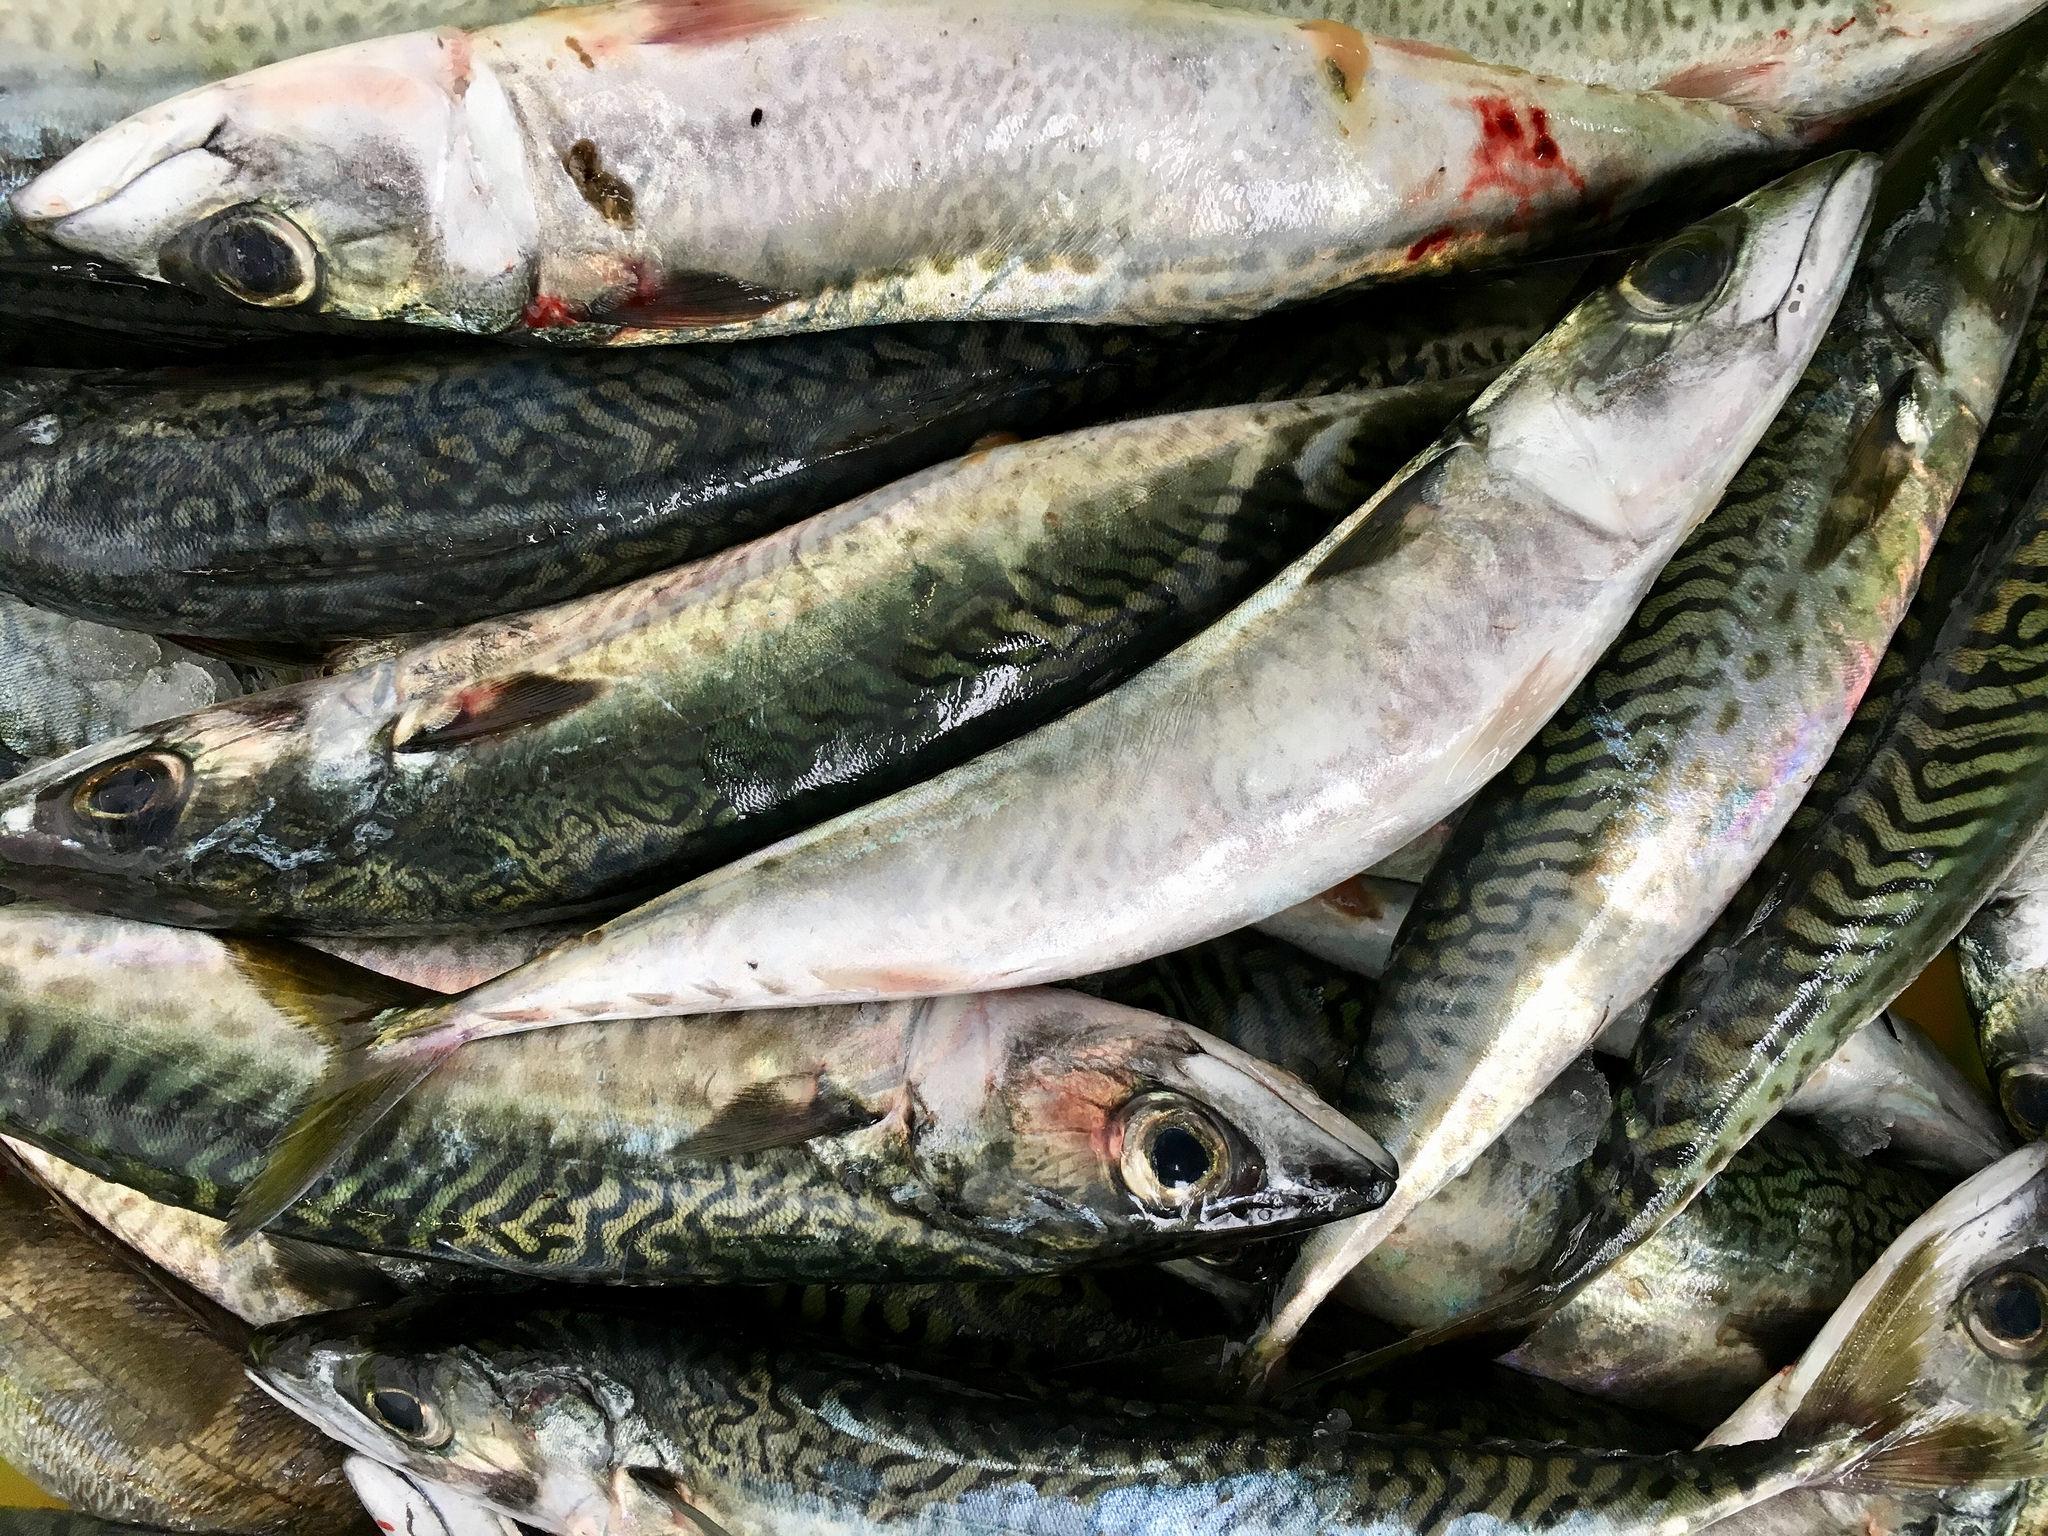 Icelands mackerel fishery achieves msc certification as icelands mackerel fishery achieves msc certification as sustainable well managed fishery xflitez Choice Image